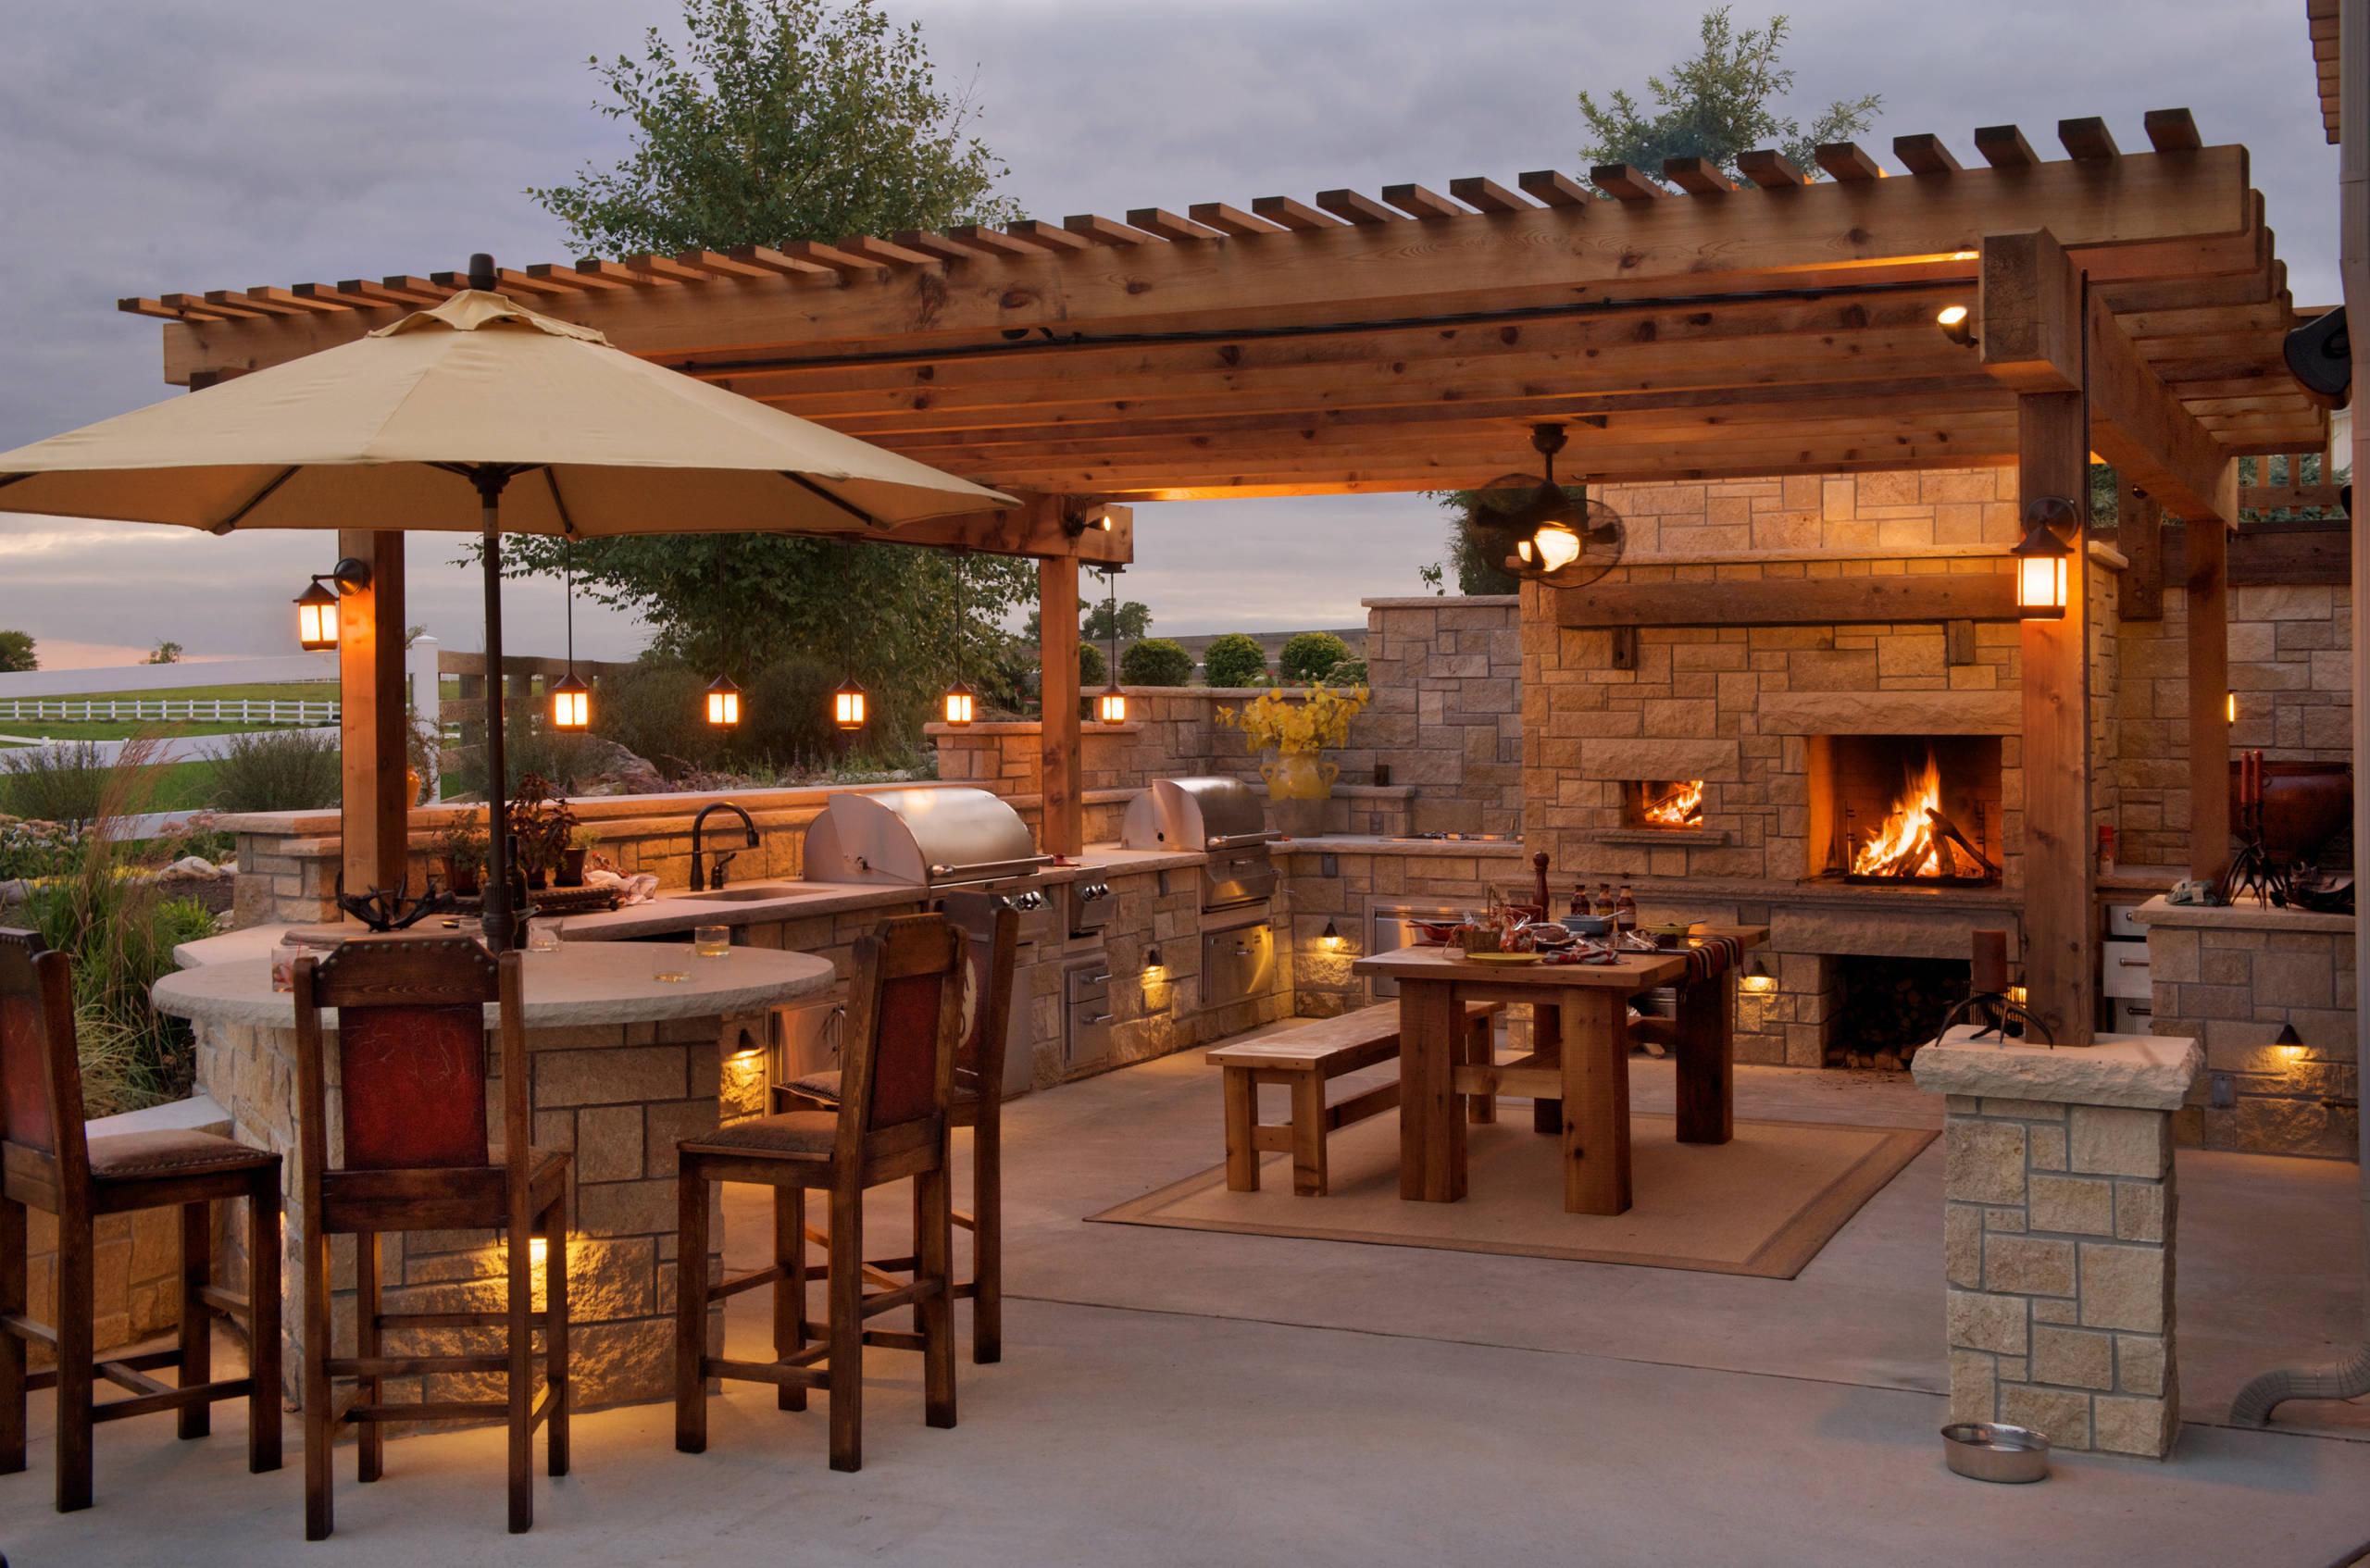 75 Beautiful Farmhouse Outdoor Kitchen Design Houzz Pictures Ideas July 2021 Houzz